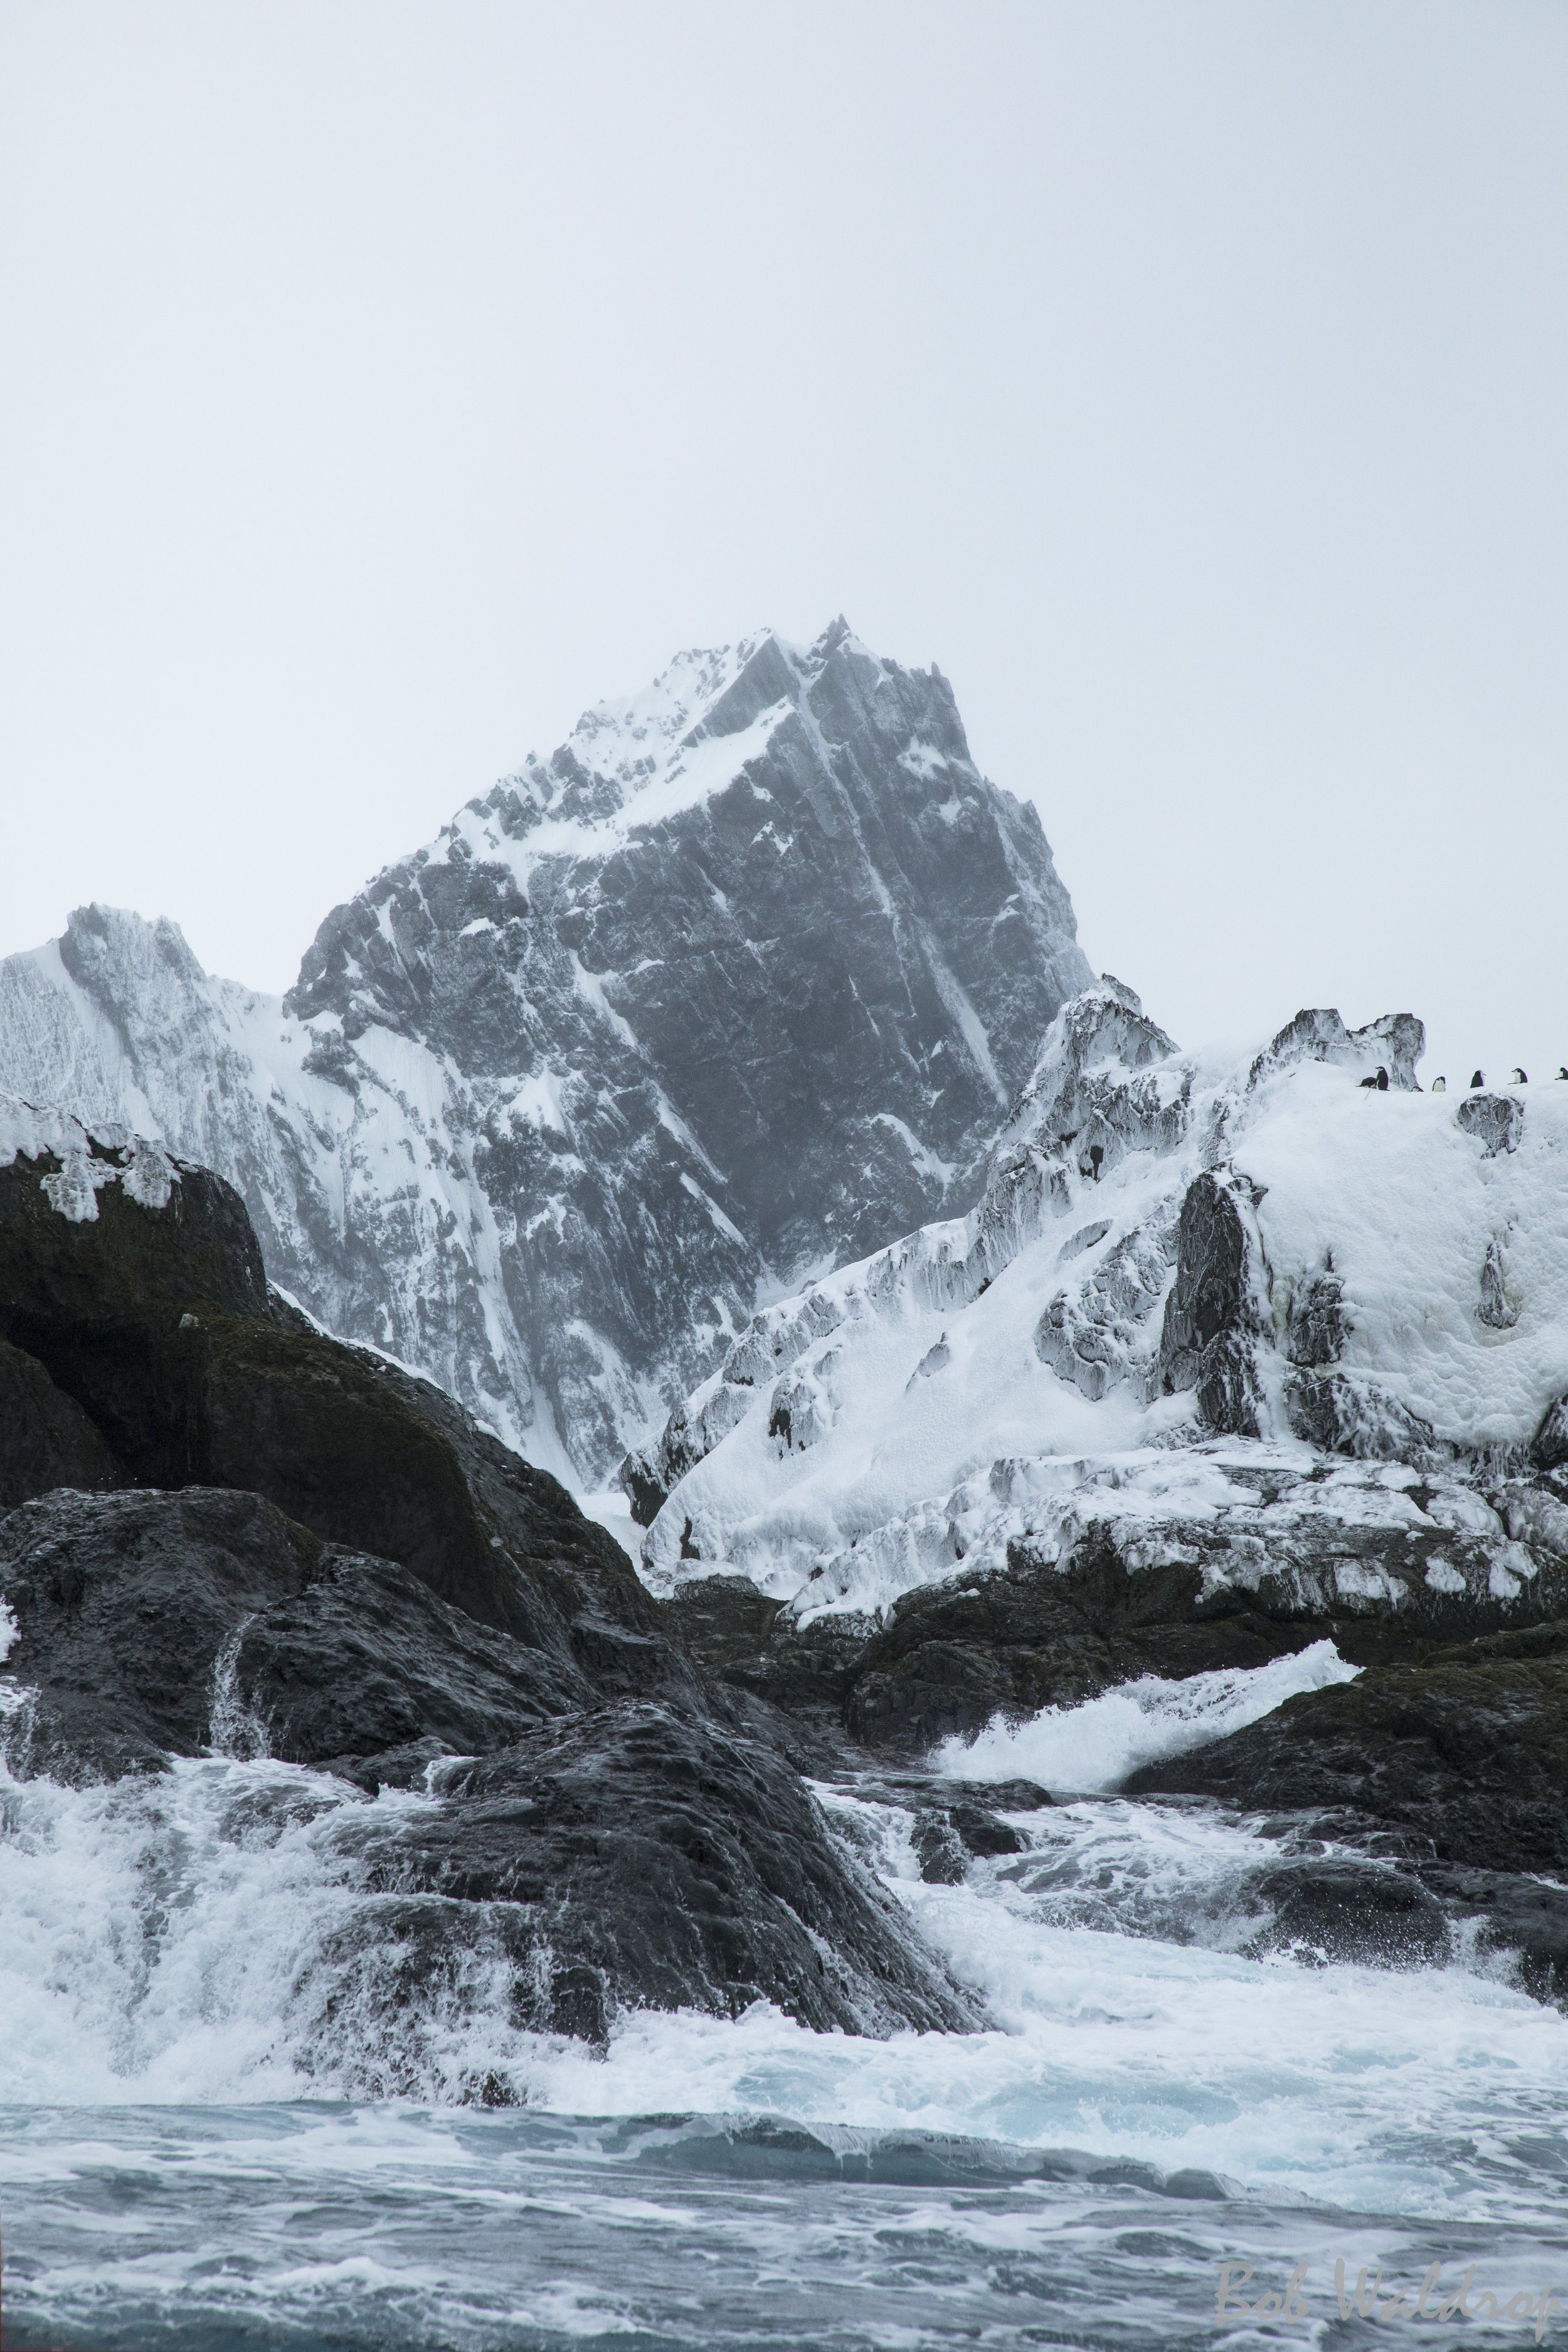 Antarctica-8765-Edit.JPG